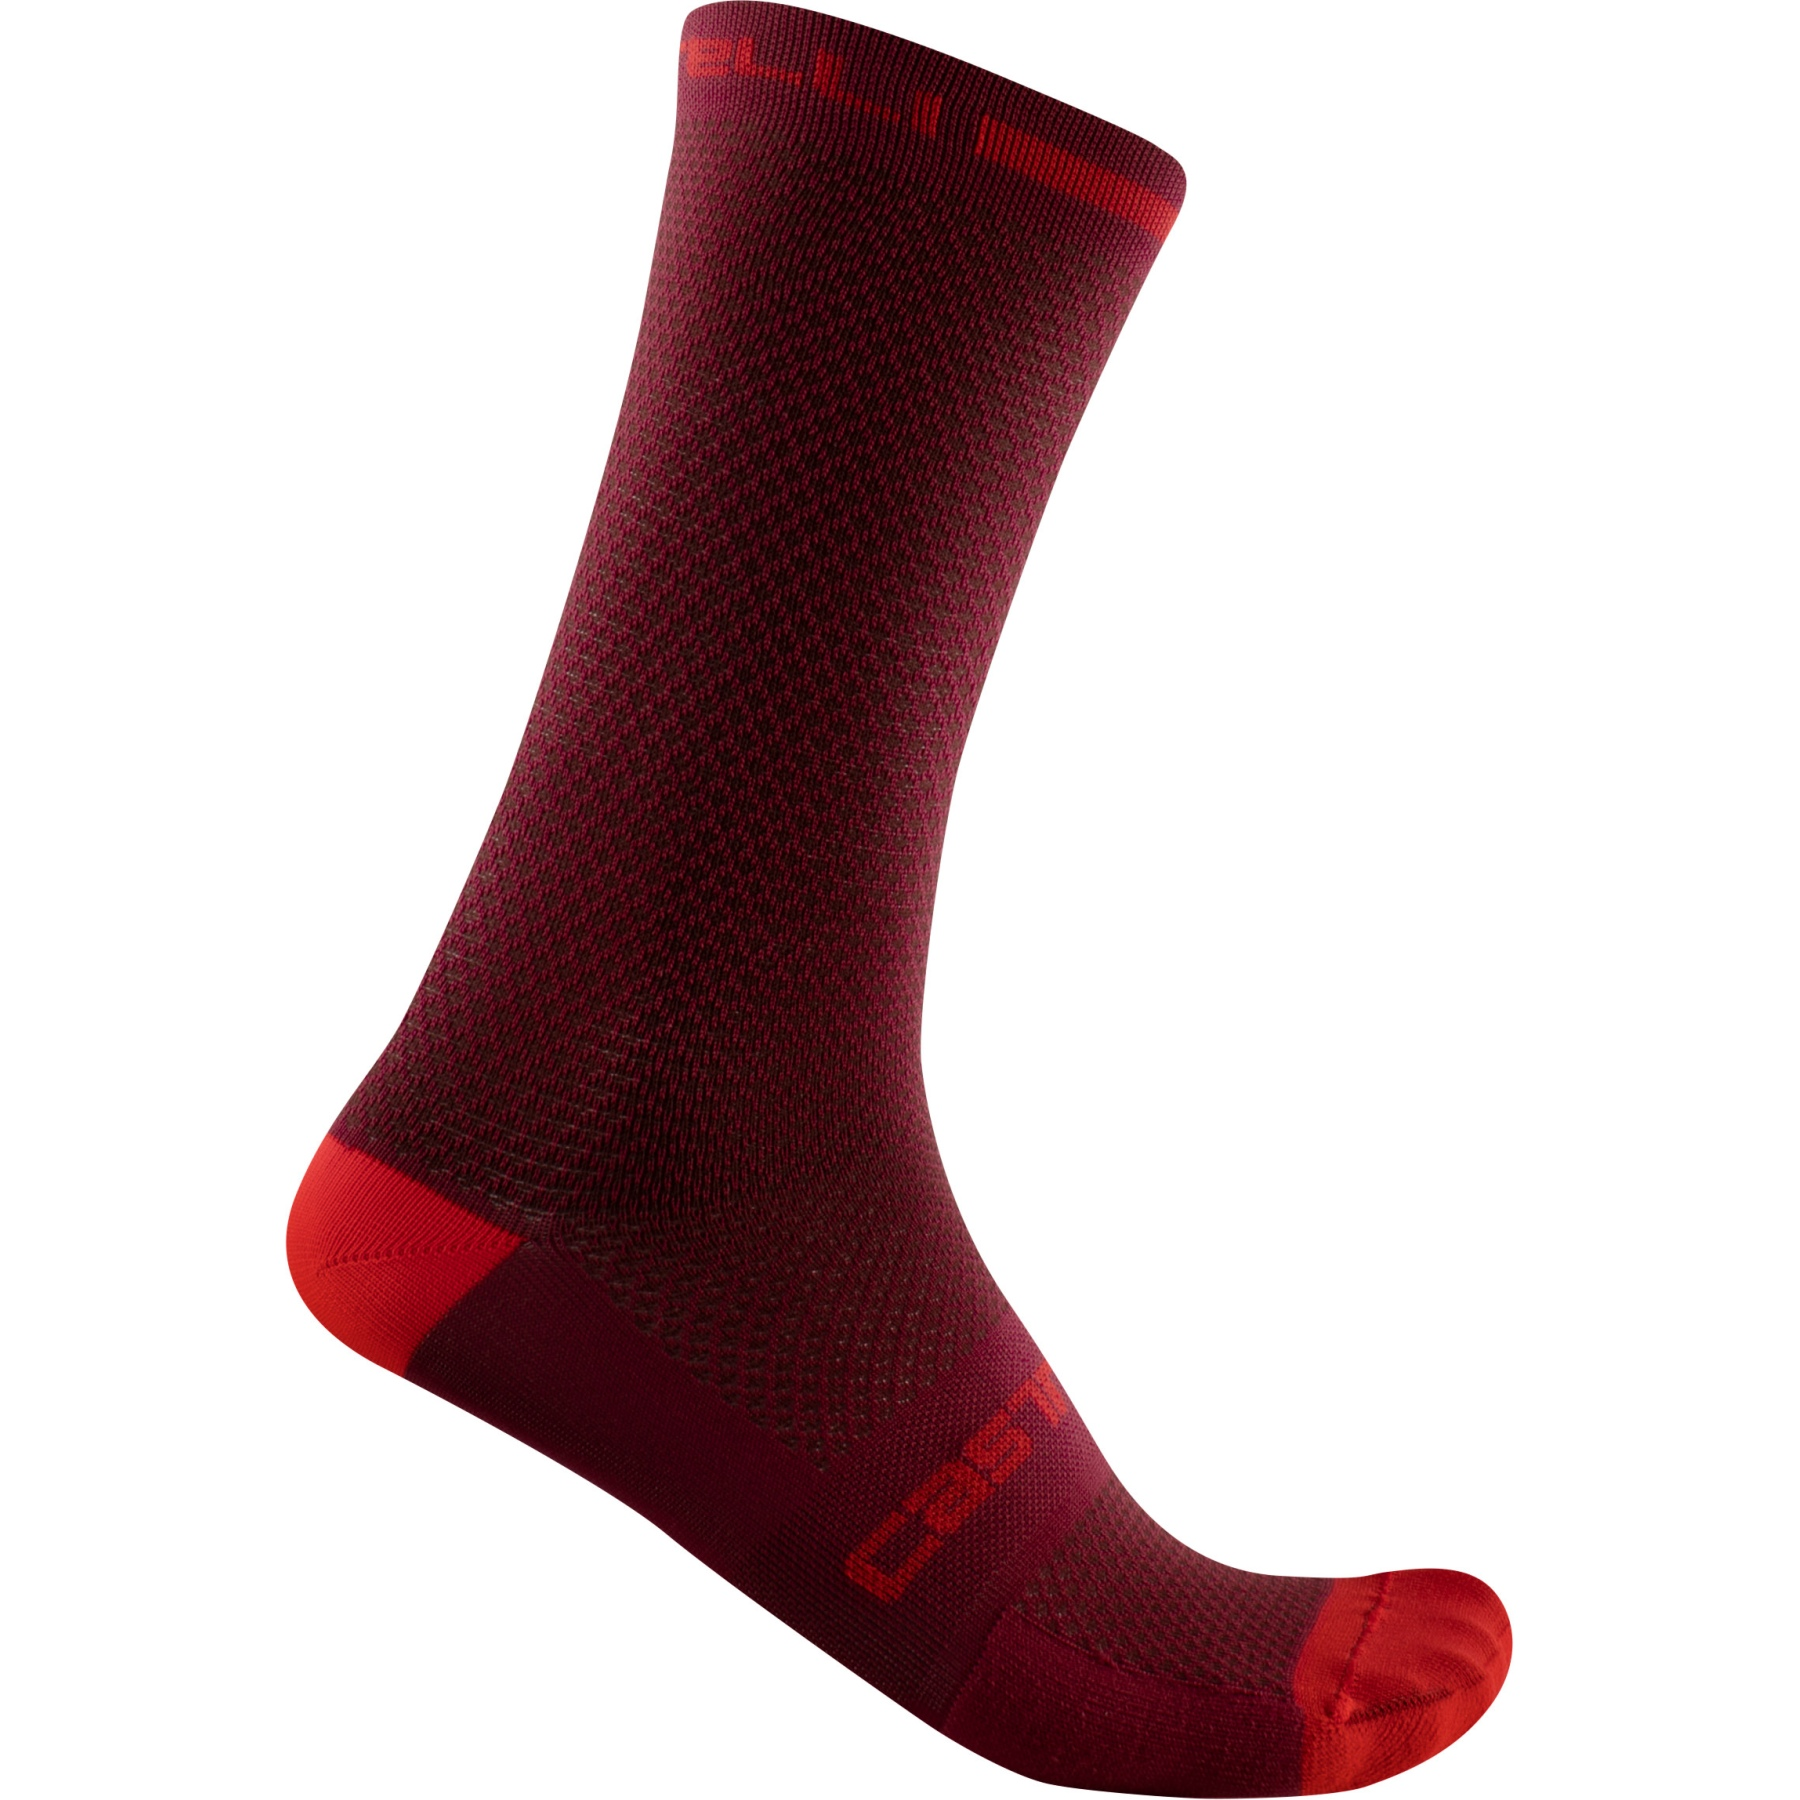 Castelli Superleggera T 18 Socks - bordeaux 421